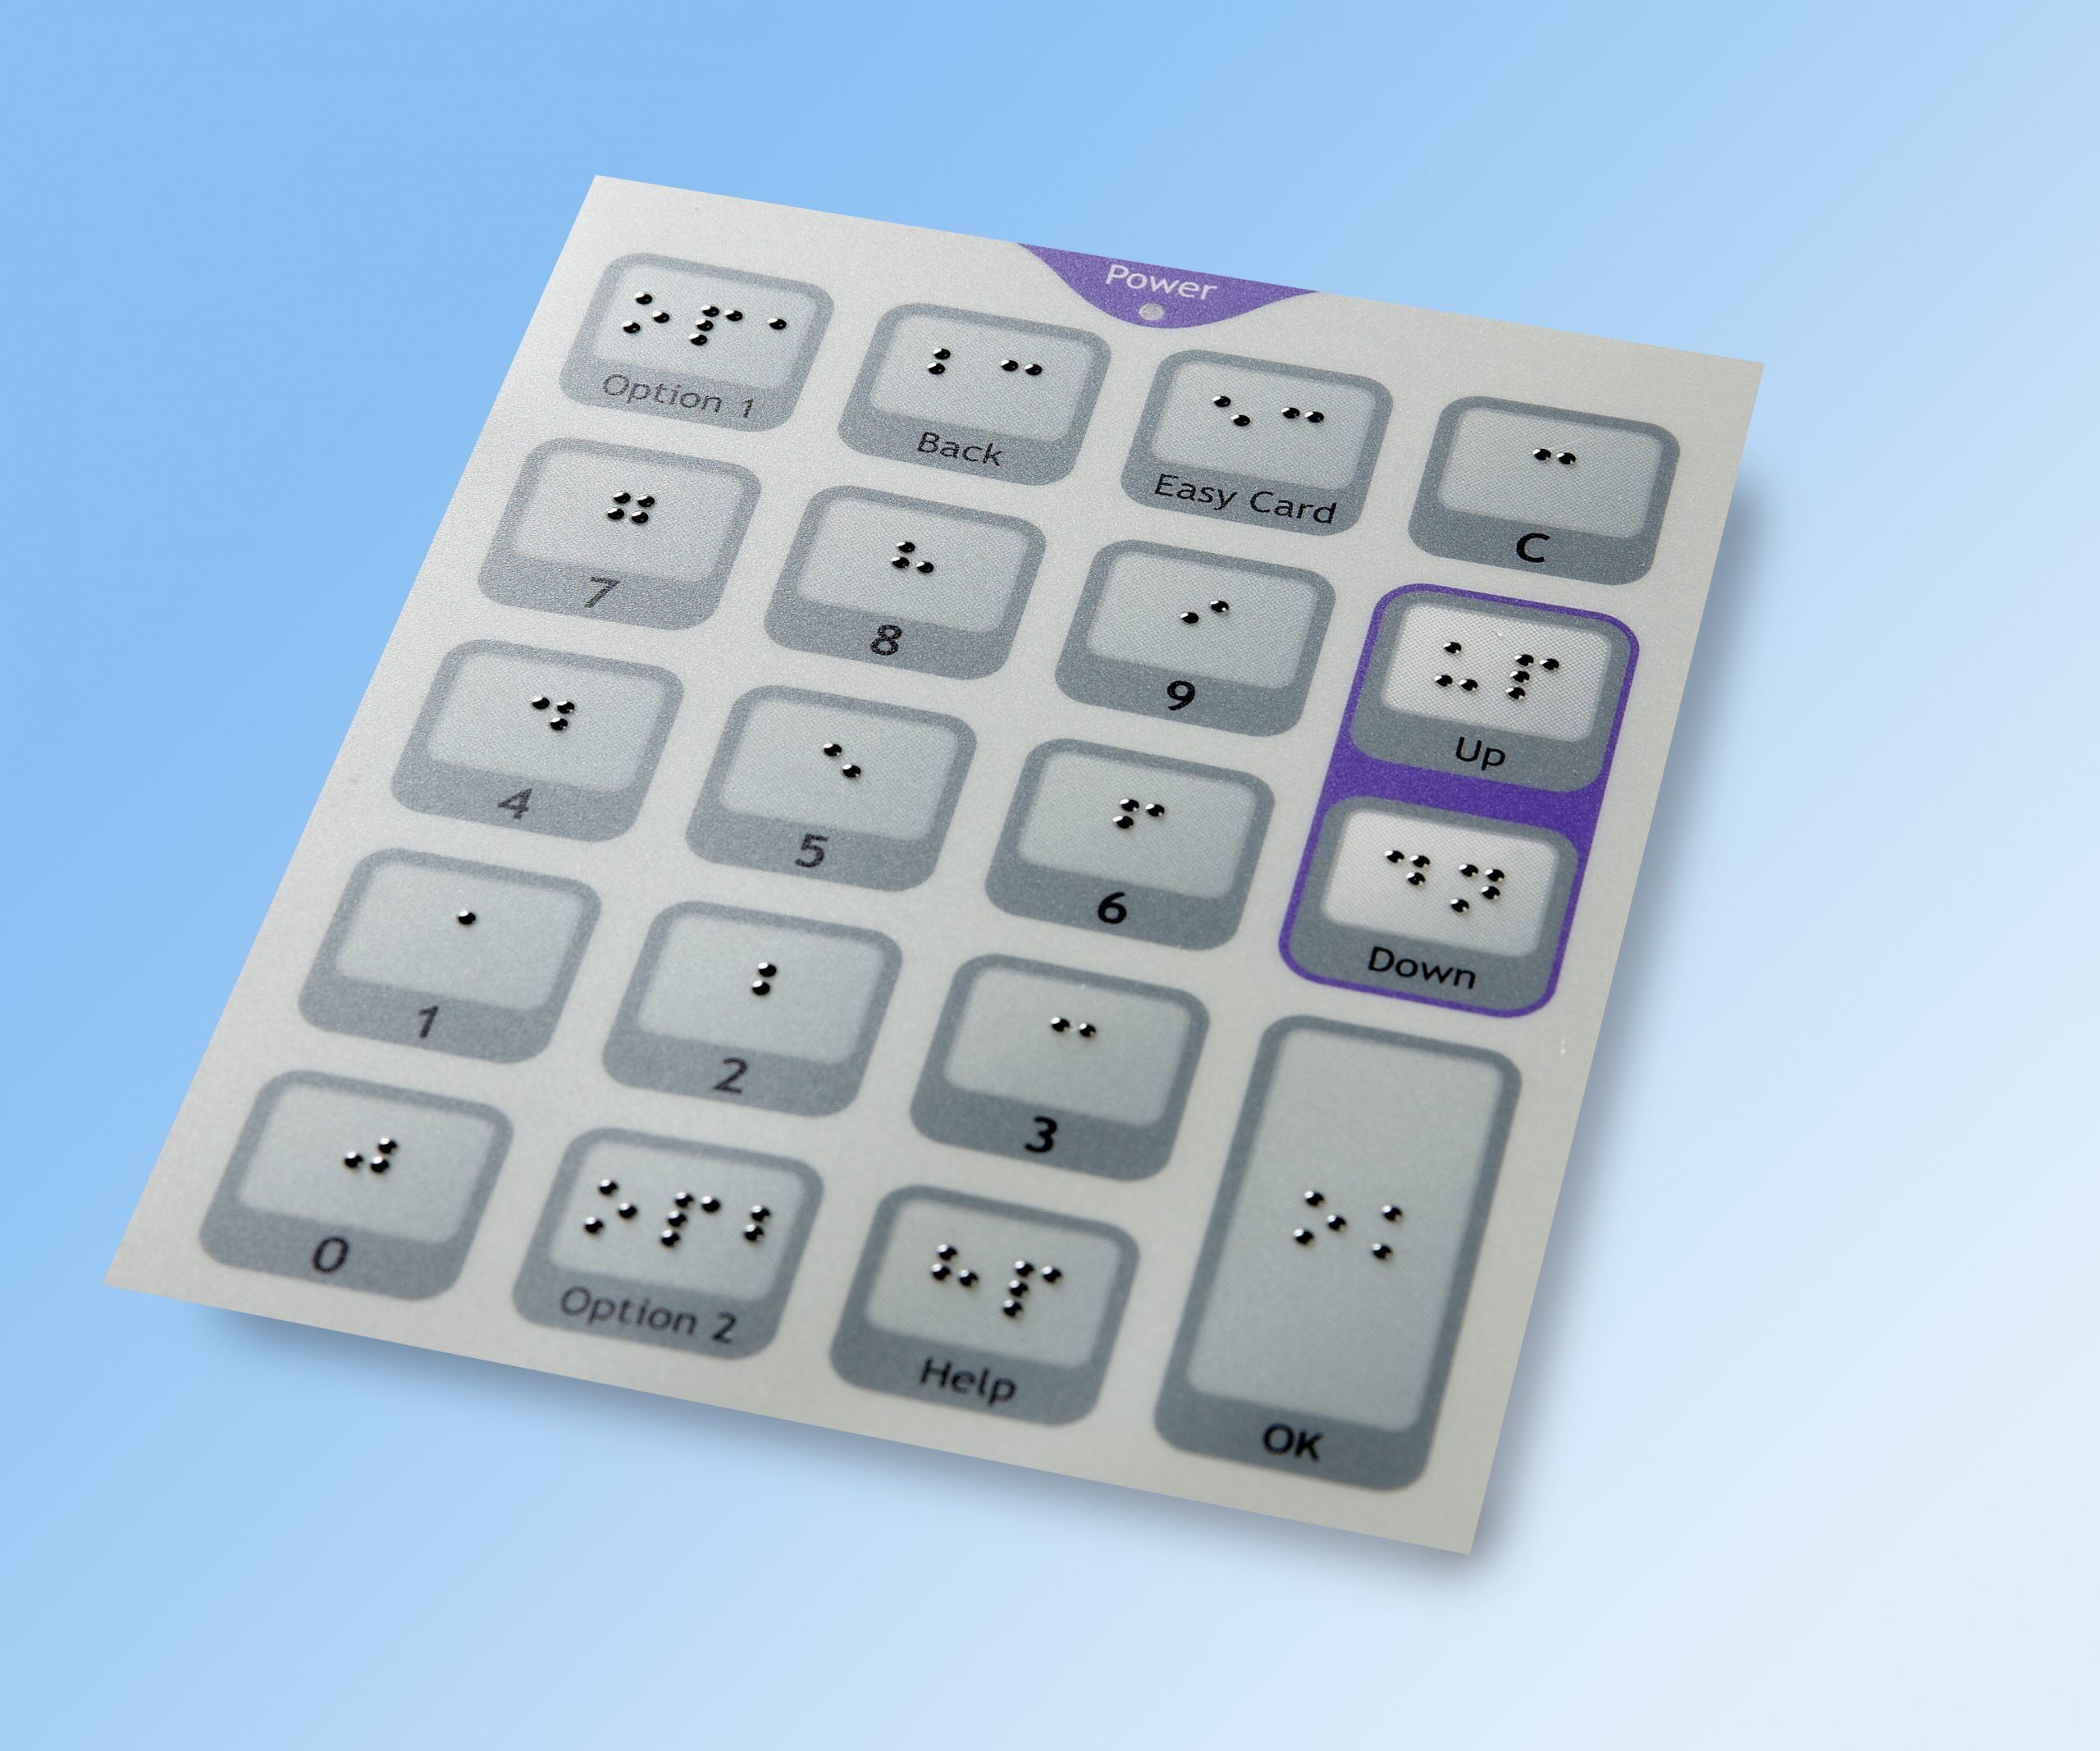 keyboard-19